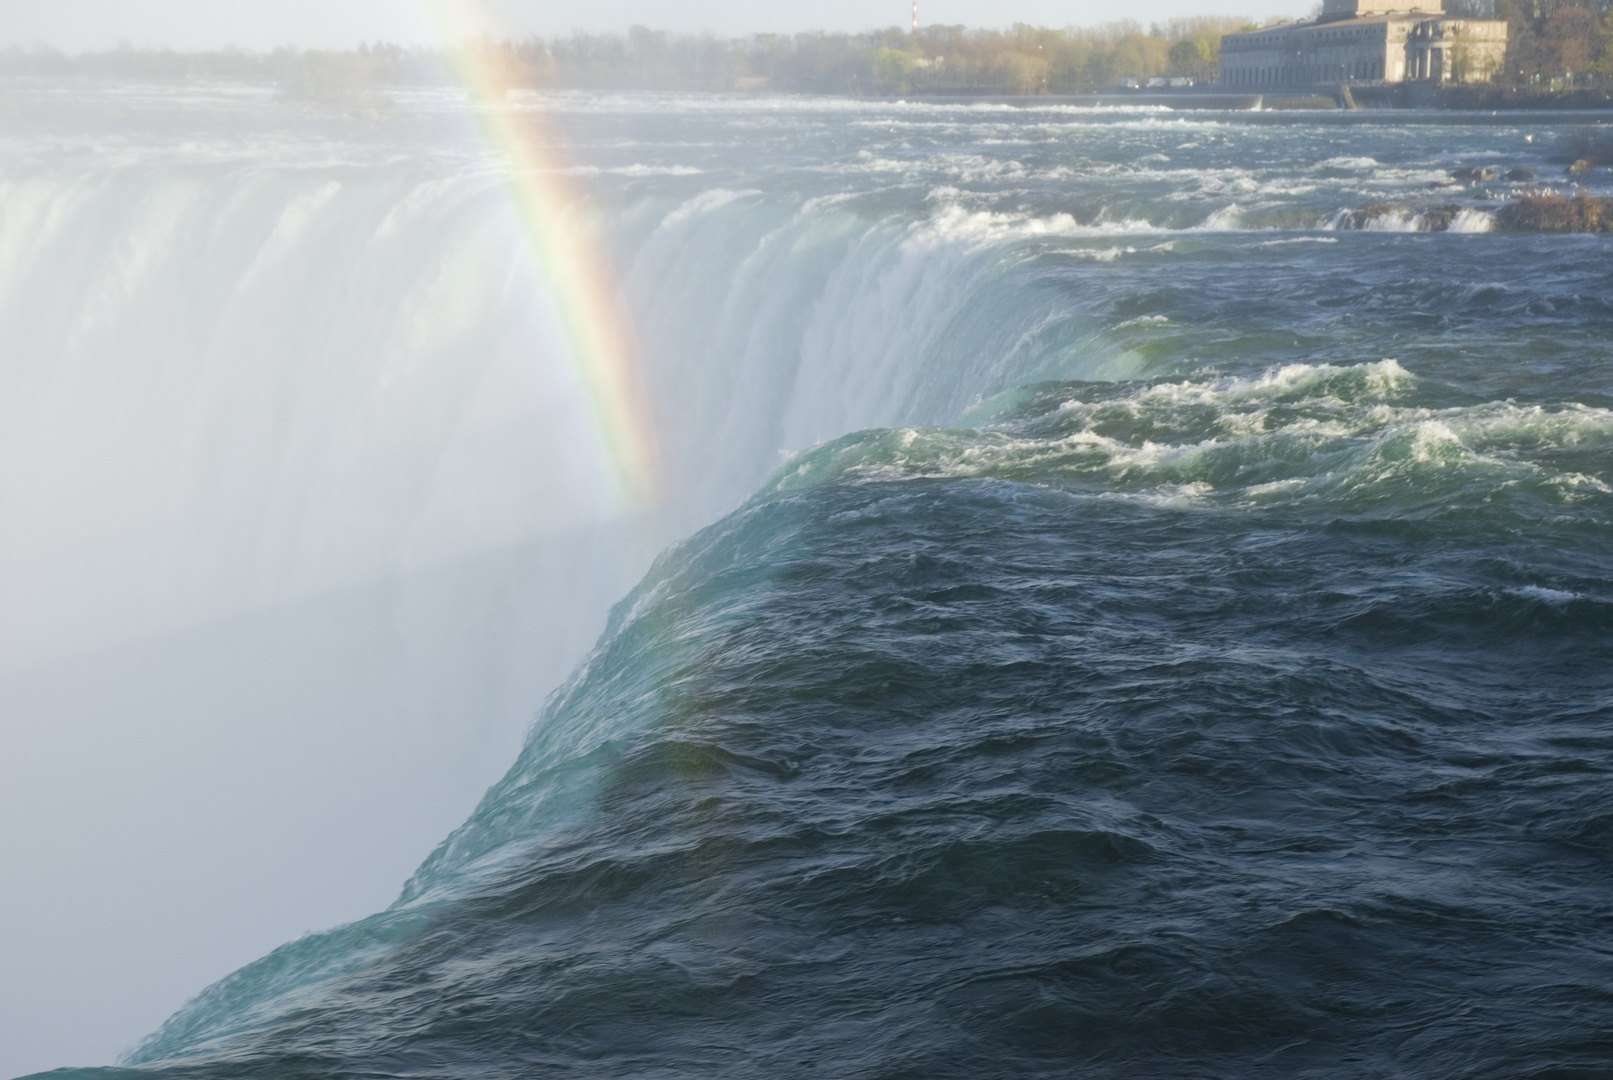 Niagara Falls - Horseshoe